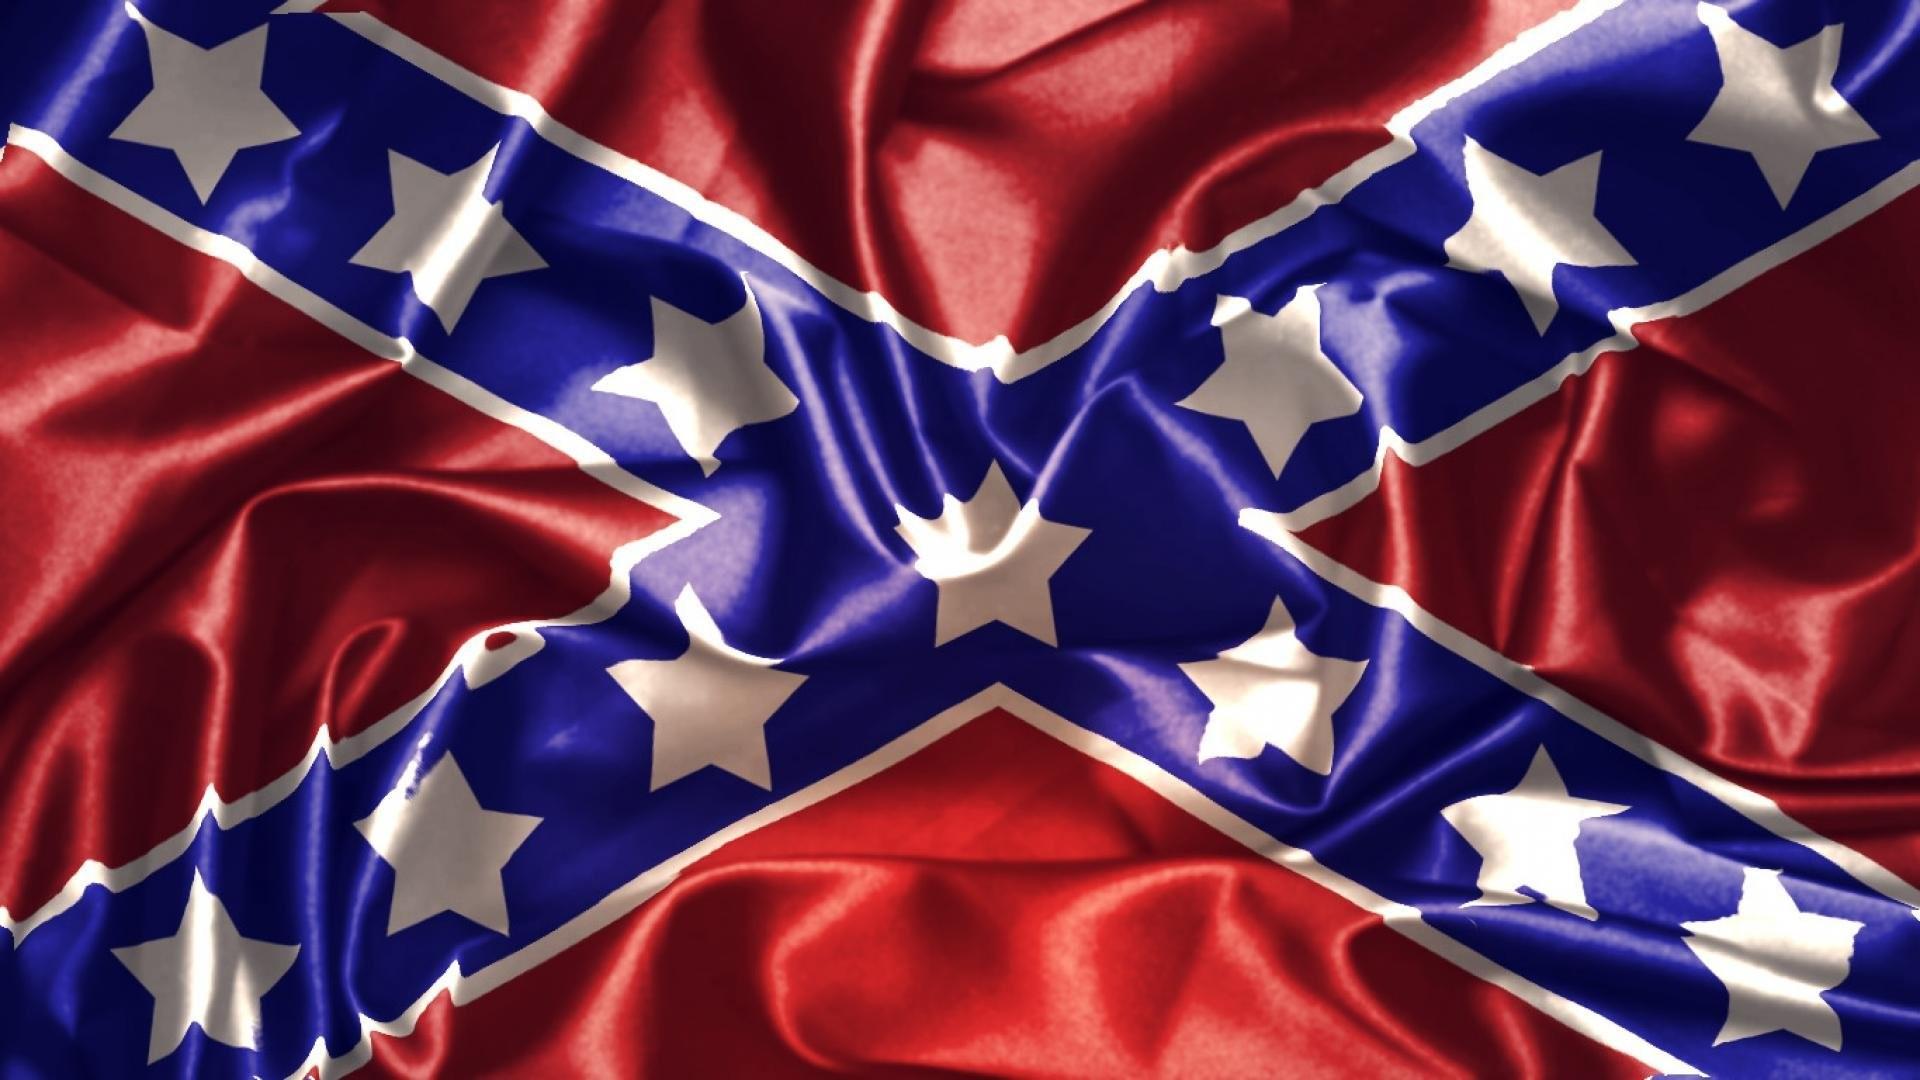 Флаг конфедерации картинки